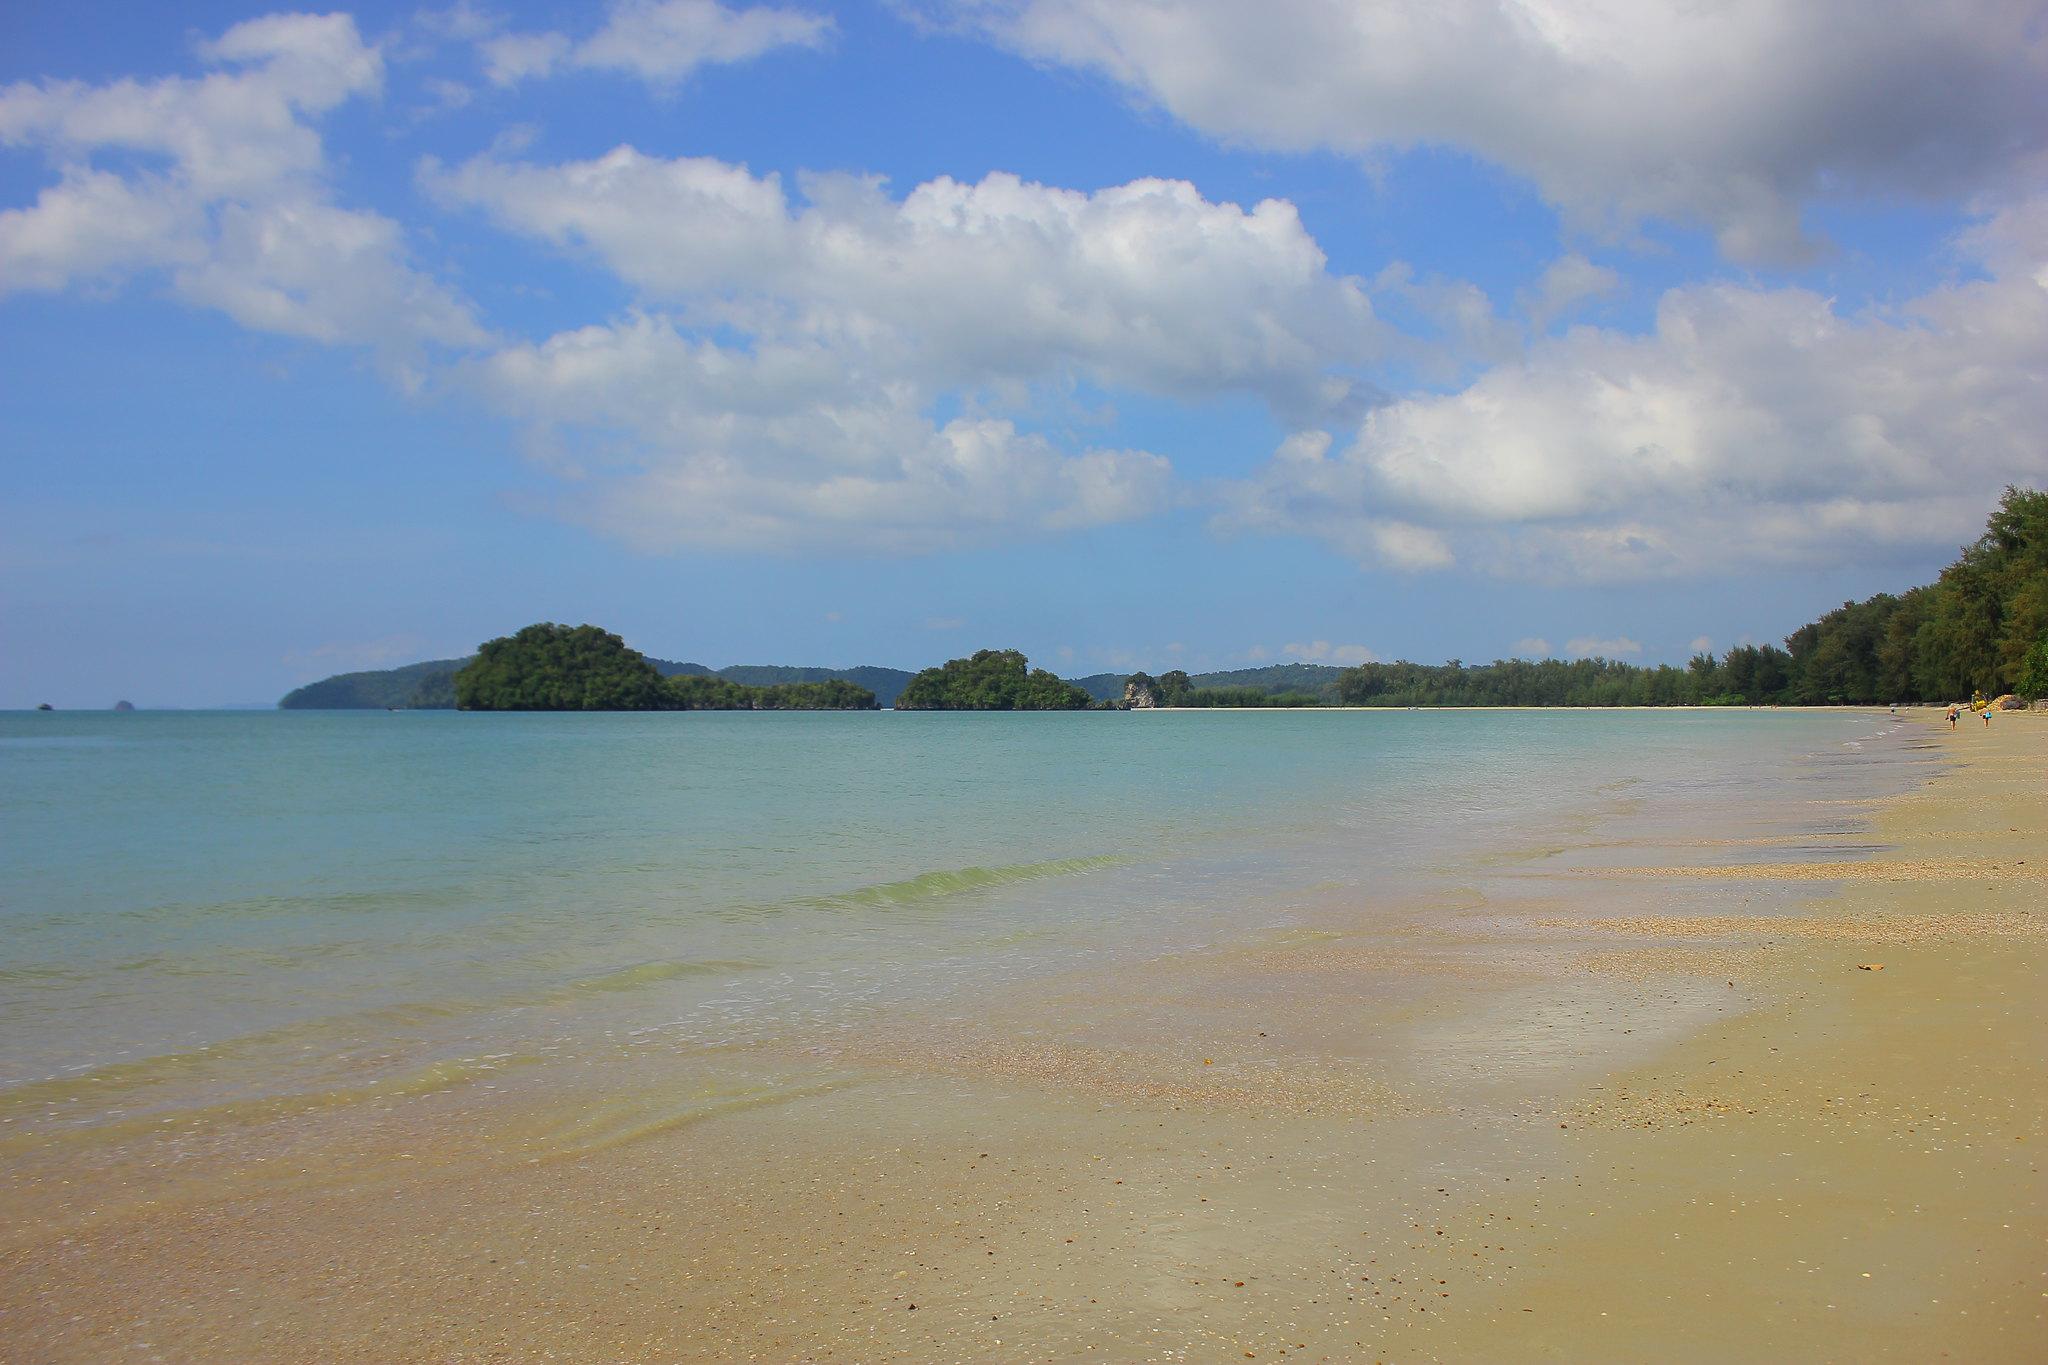 Nopparat Thara Beach